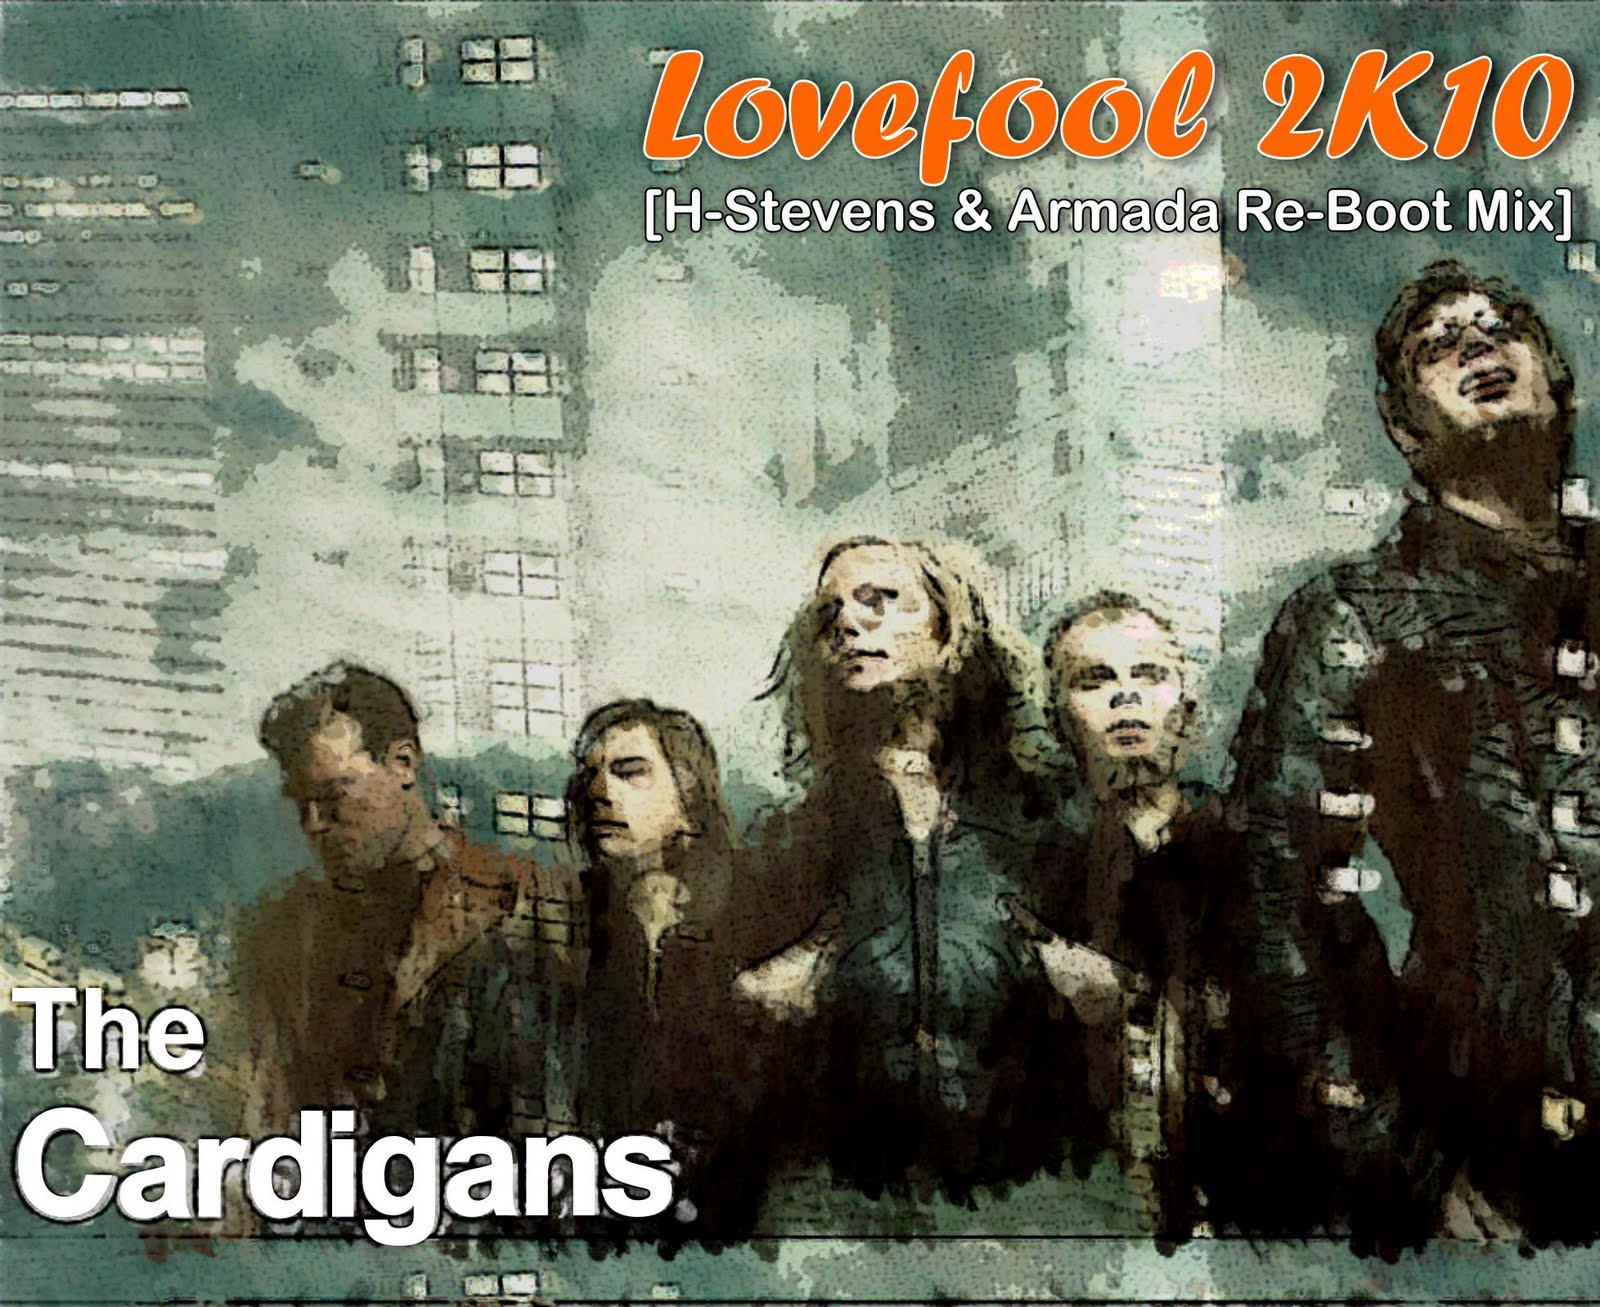 http://3.bp.blogspot.com/_rF_VQb3ztD4/TCVeoR7yTII/AAAAAAAACjs/lnFy2QHW5fc/s1600/The+Cardigans+-+Lovefool+2k10+%5BH-Stevens+%26+Armada+Re-Boot+Mix%5D.JPG